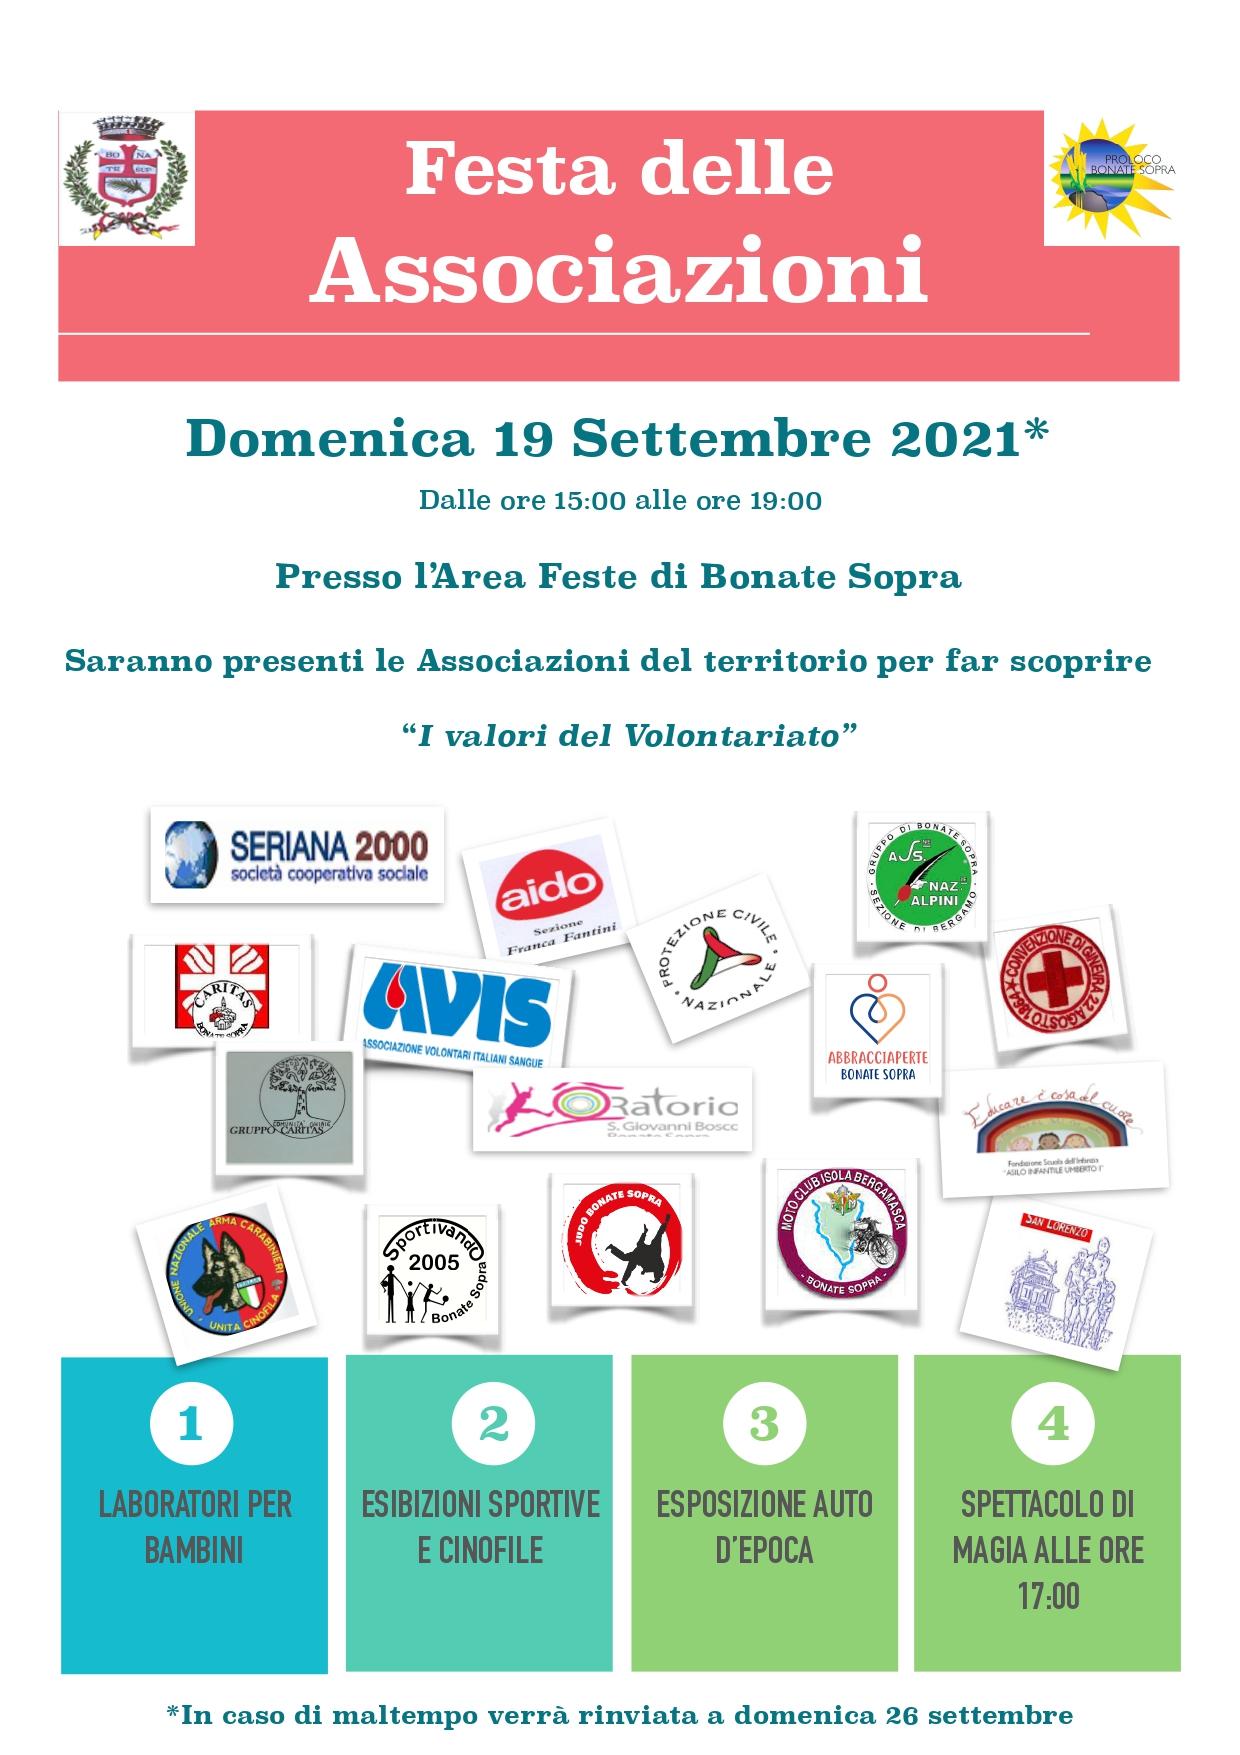 Locandina Festa Associazioni (2)_pages-to-jpg-0001